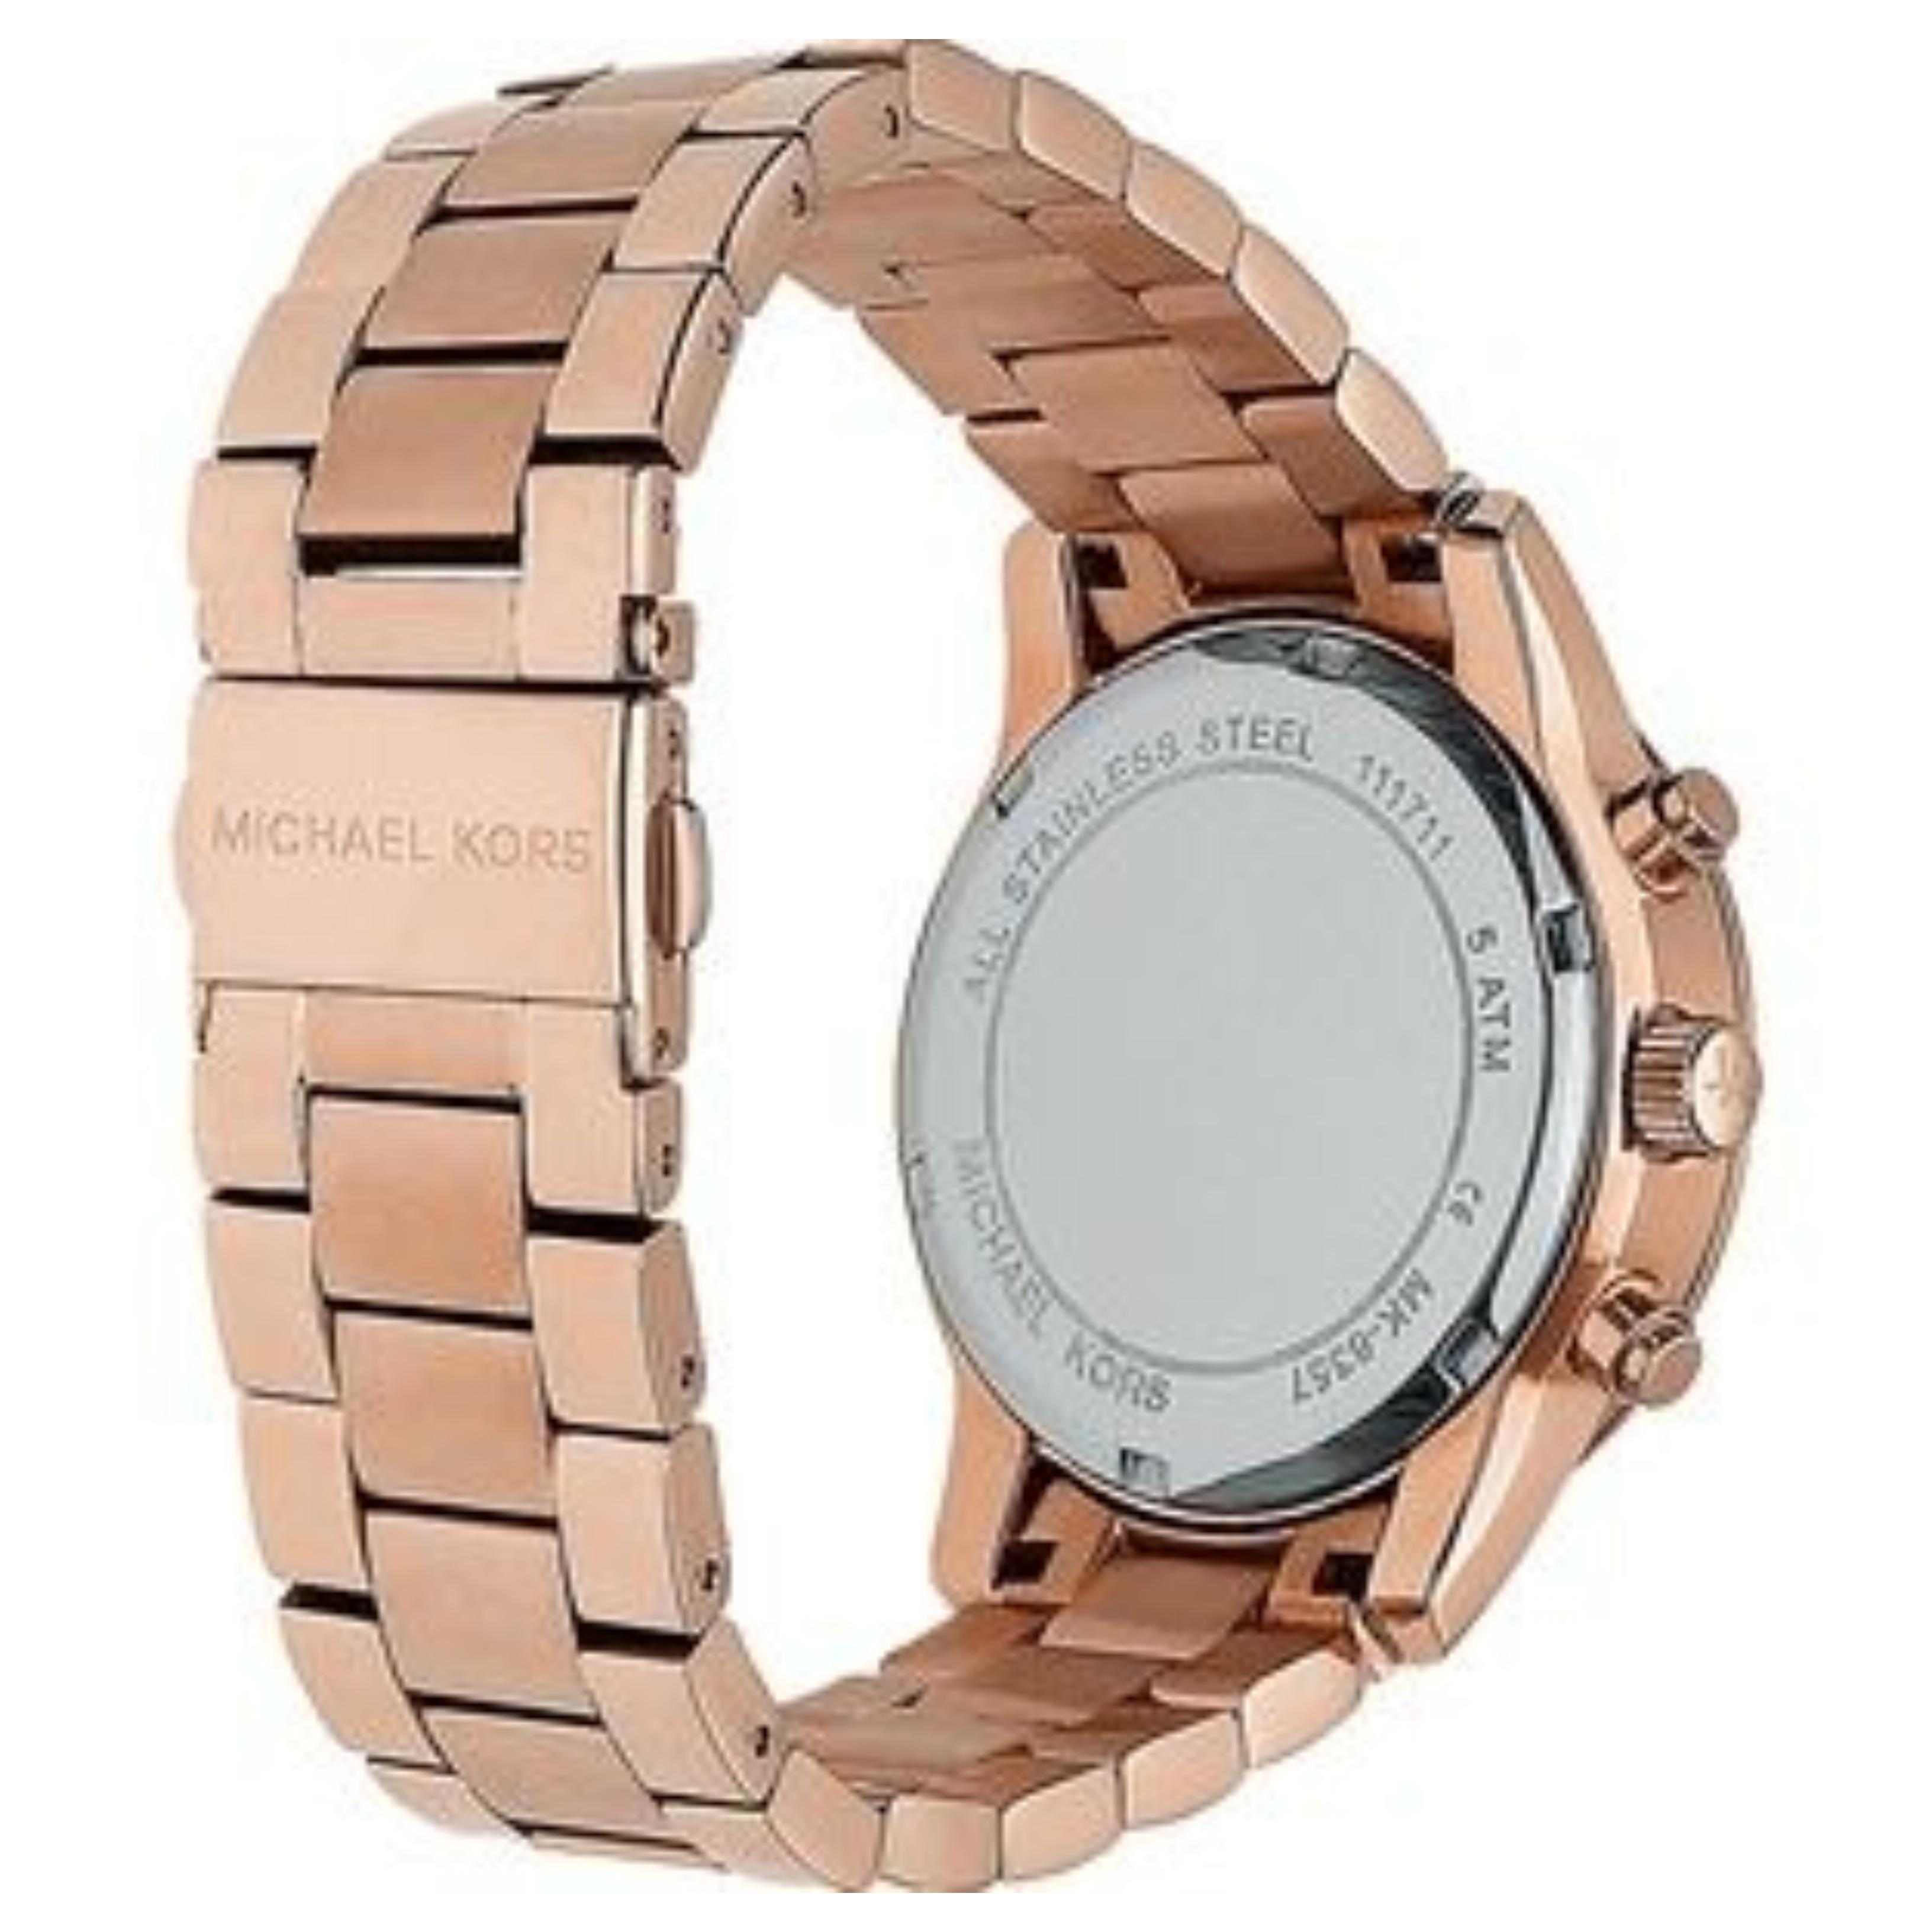 a11631c93d79 Sentinel Michael Kors Ritz Women Watch MK6357│Crystal Index Dial│Rose Gold  Bracelet Band